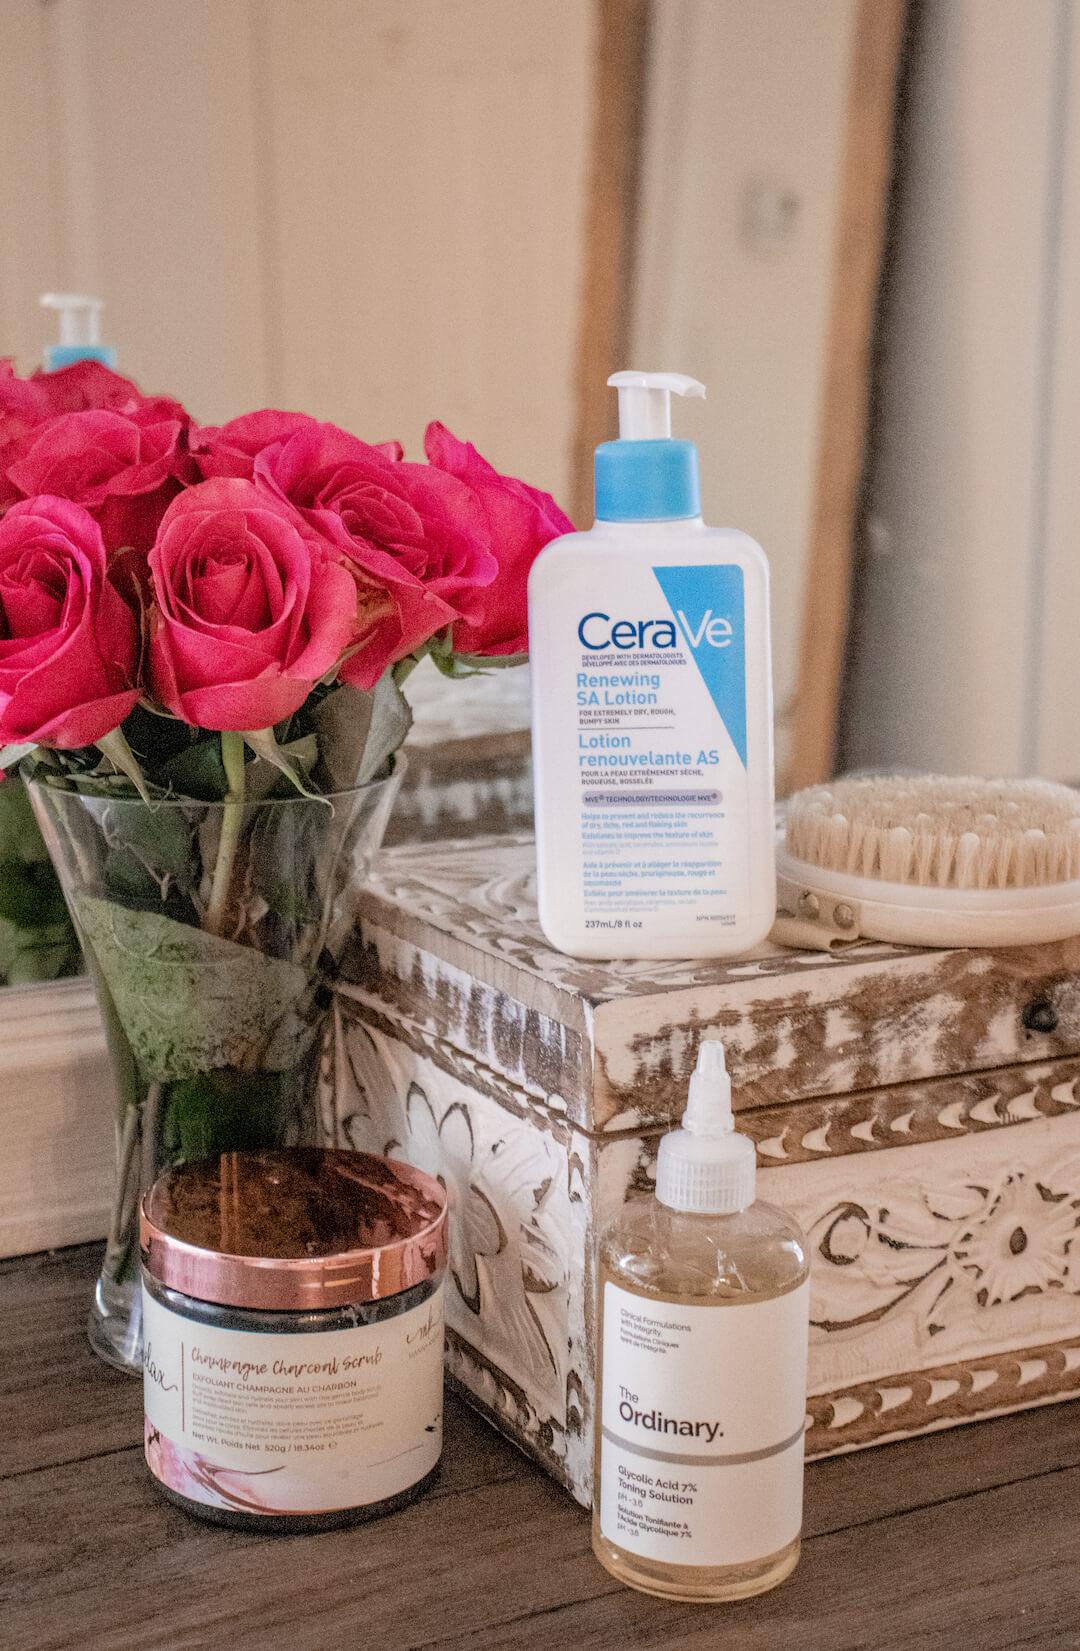 The 5 Products I Use to Treat Keratosis Pilaris